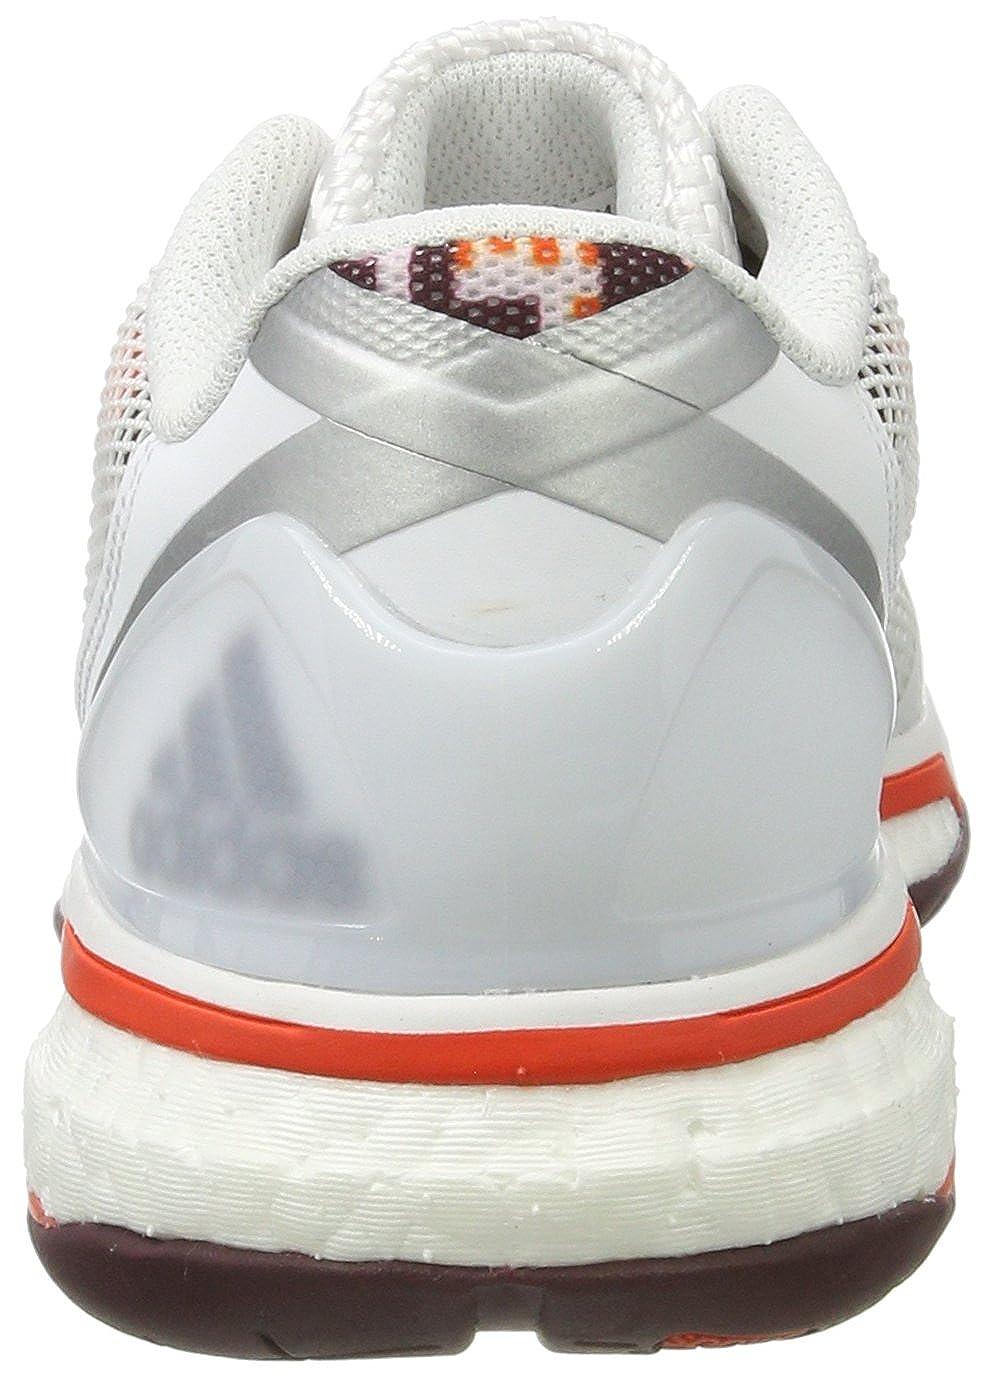 adidas Stabil Boost 20Y Handball Shoes Women Sports White